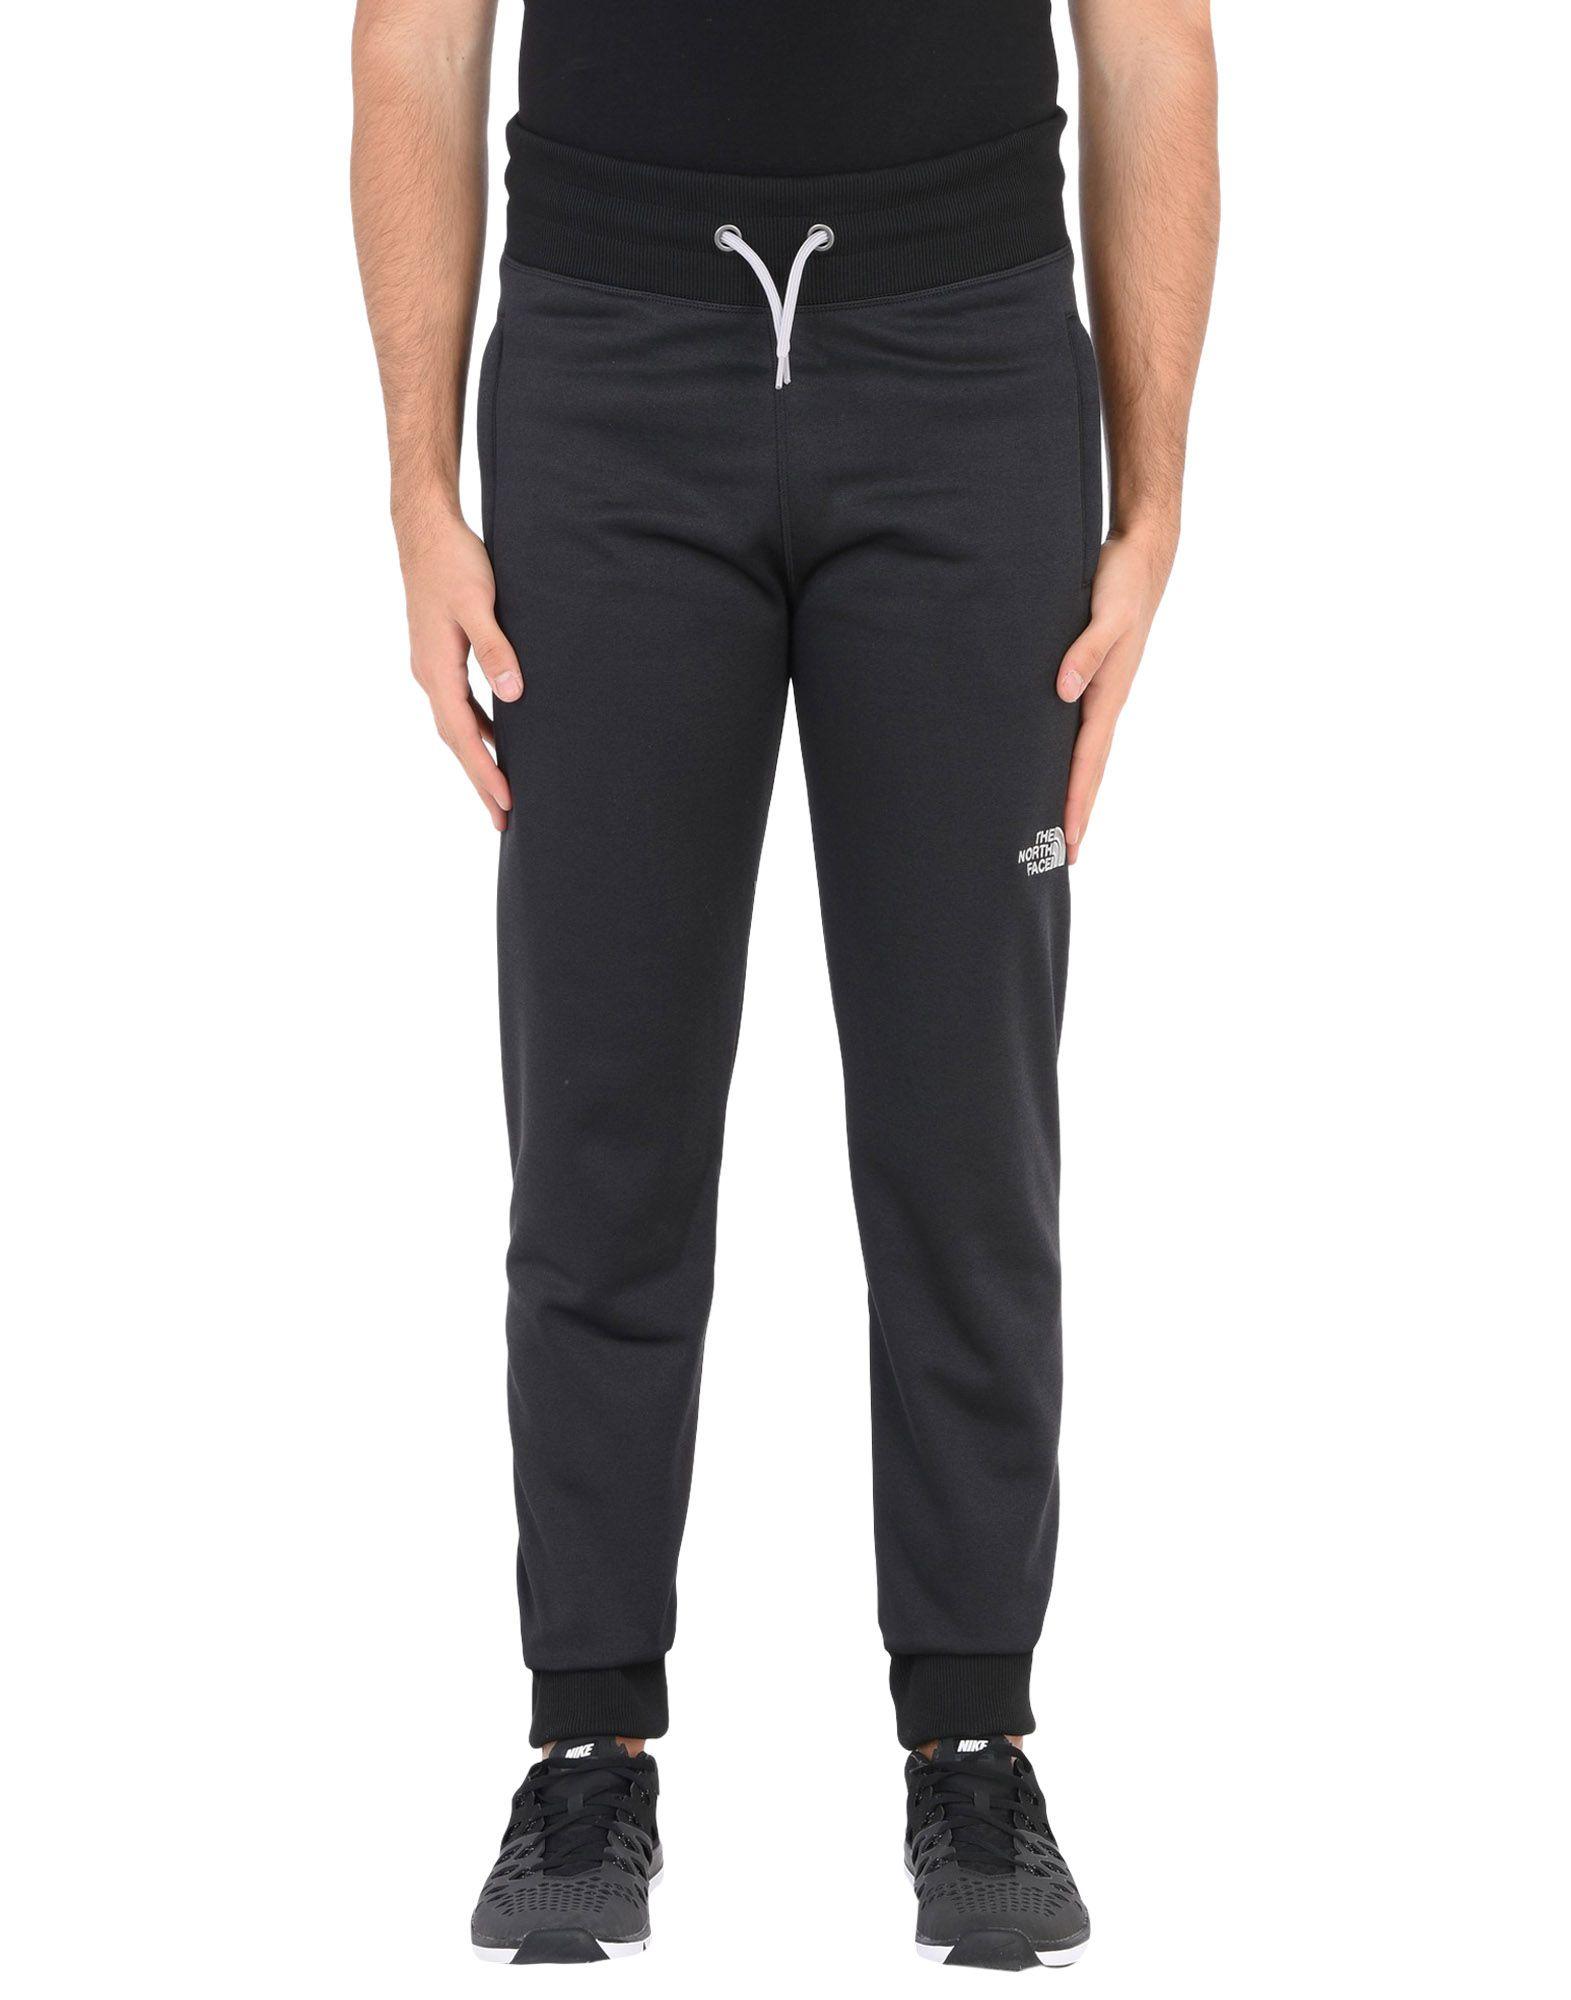 Pantalone The North Face M Mc Nse Pant  Logowear Logowear  - Uomo - 13116755PD 9a2bb1